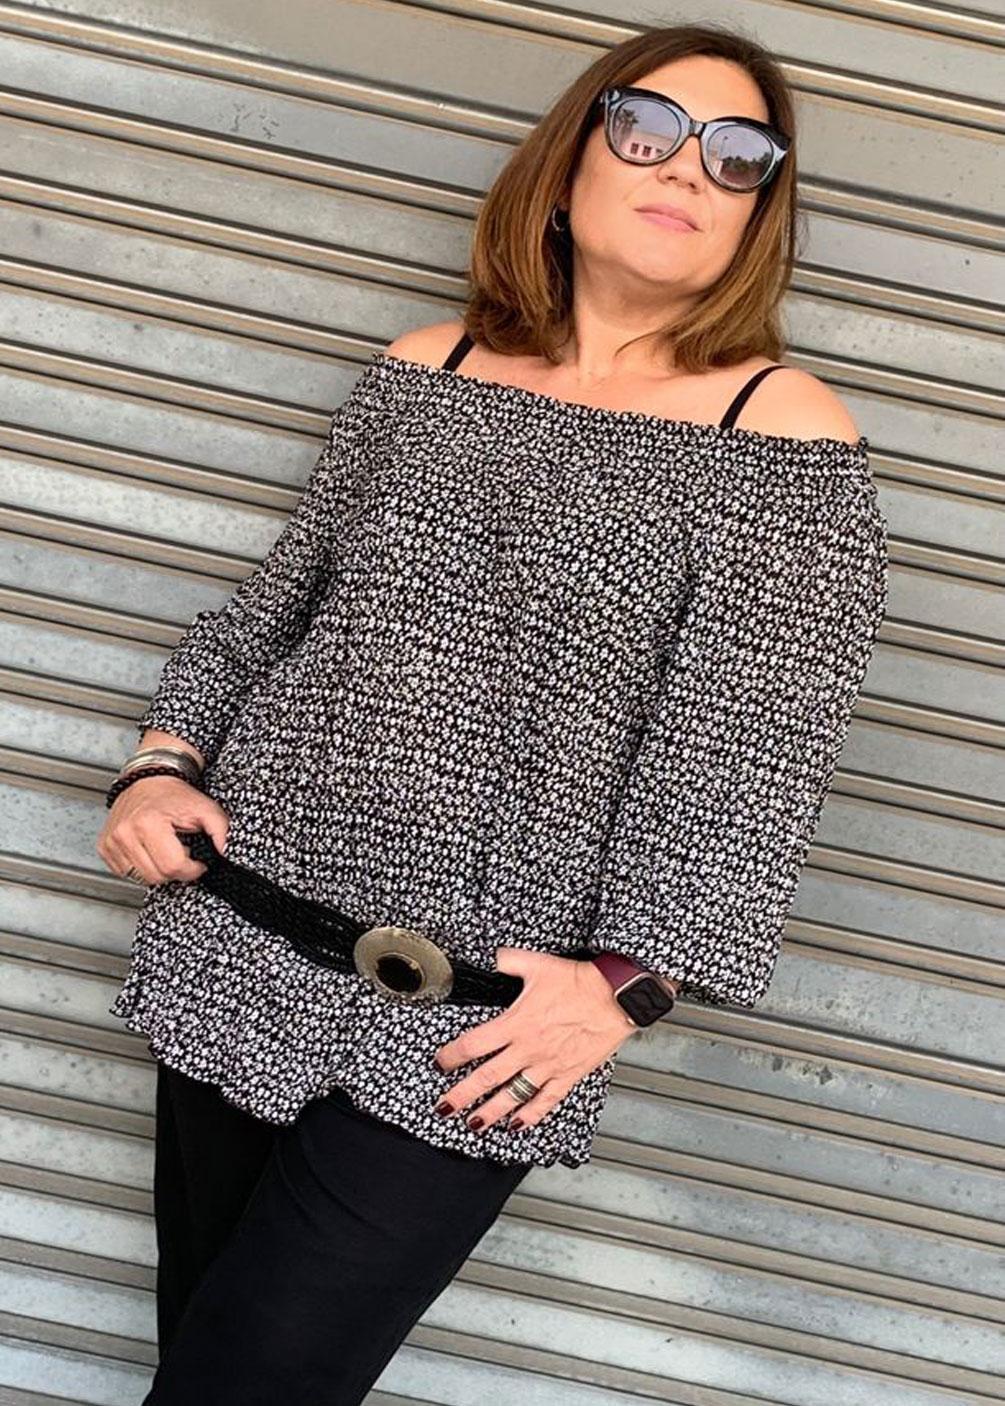 blusa mejicana hombros tallas grandes curvy ideal comoda fresquita